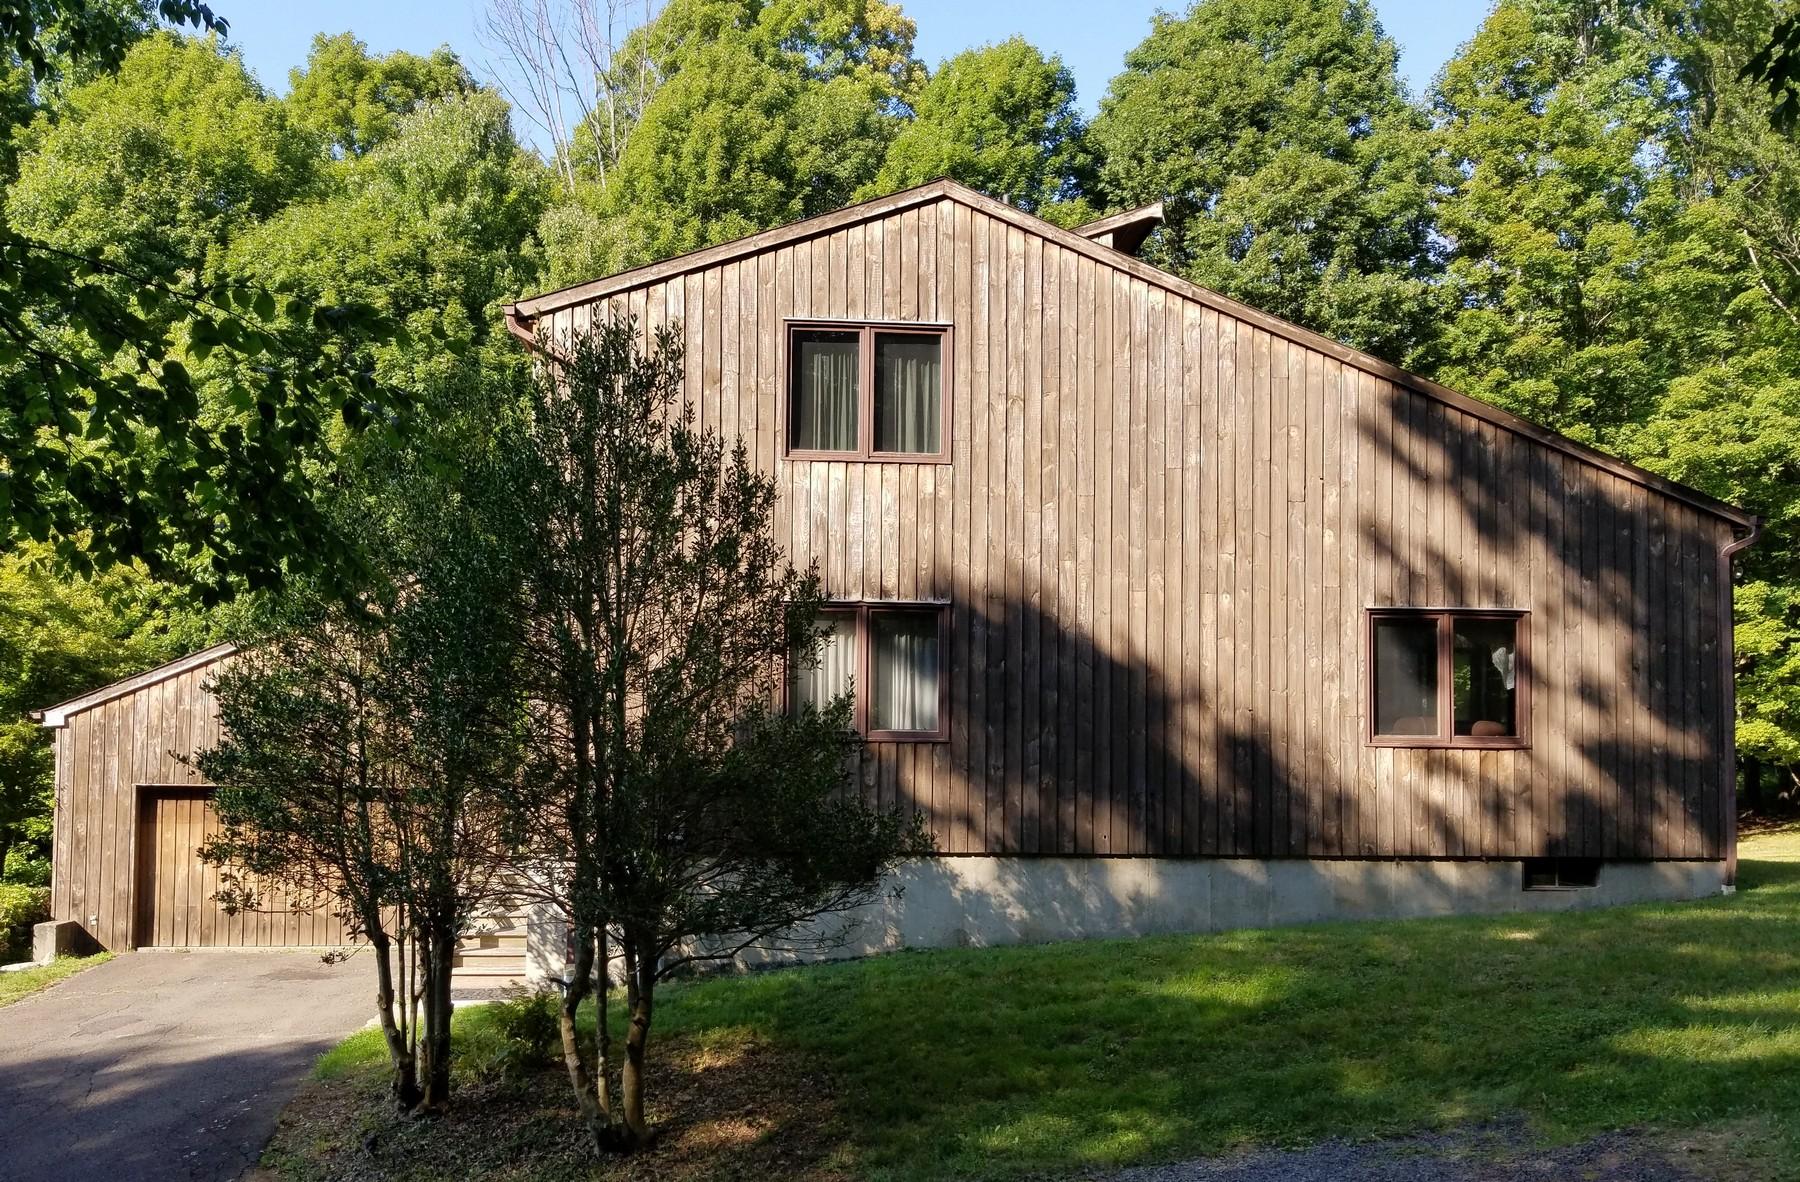 獨棟家庭住宅 為 出售 在 Contemporary Privately Set on Six Acres 49 Pine Mountain Road Ridgefield, 康涅狄格州, 06877 美國